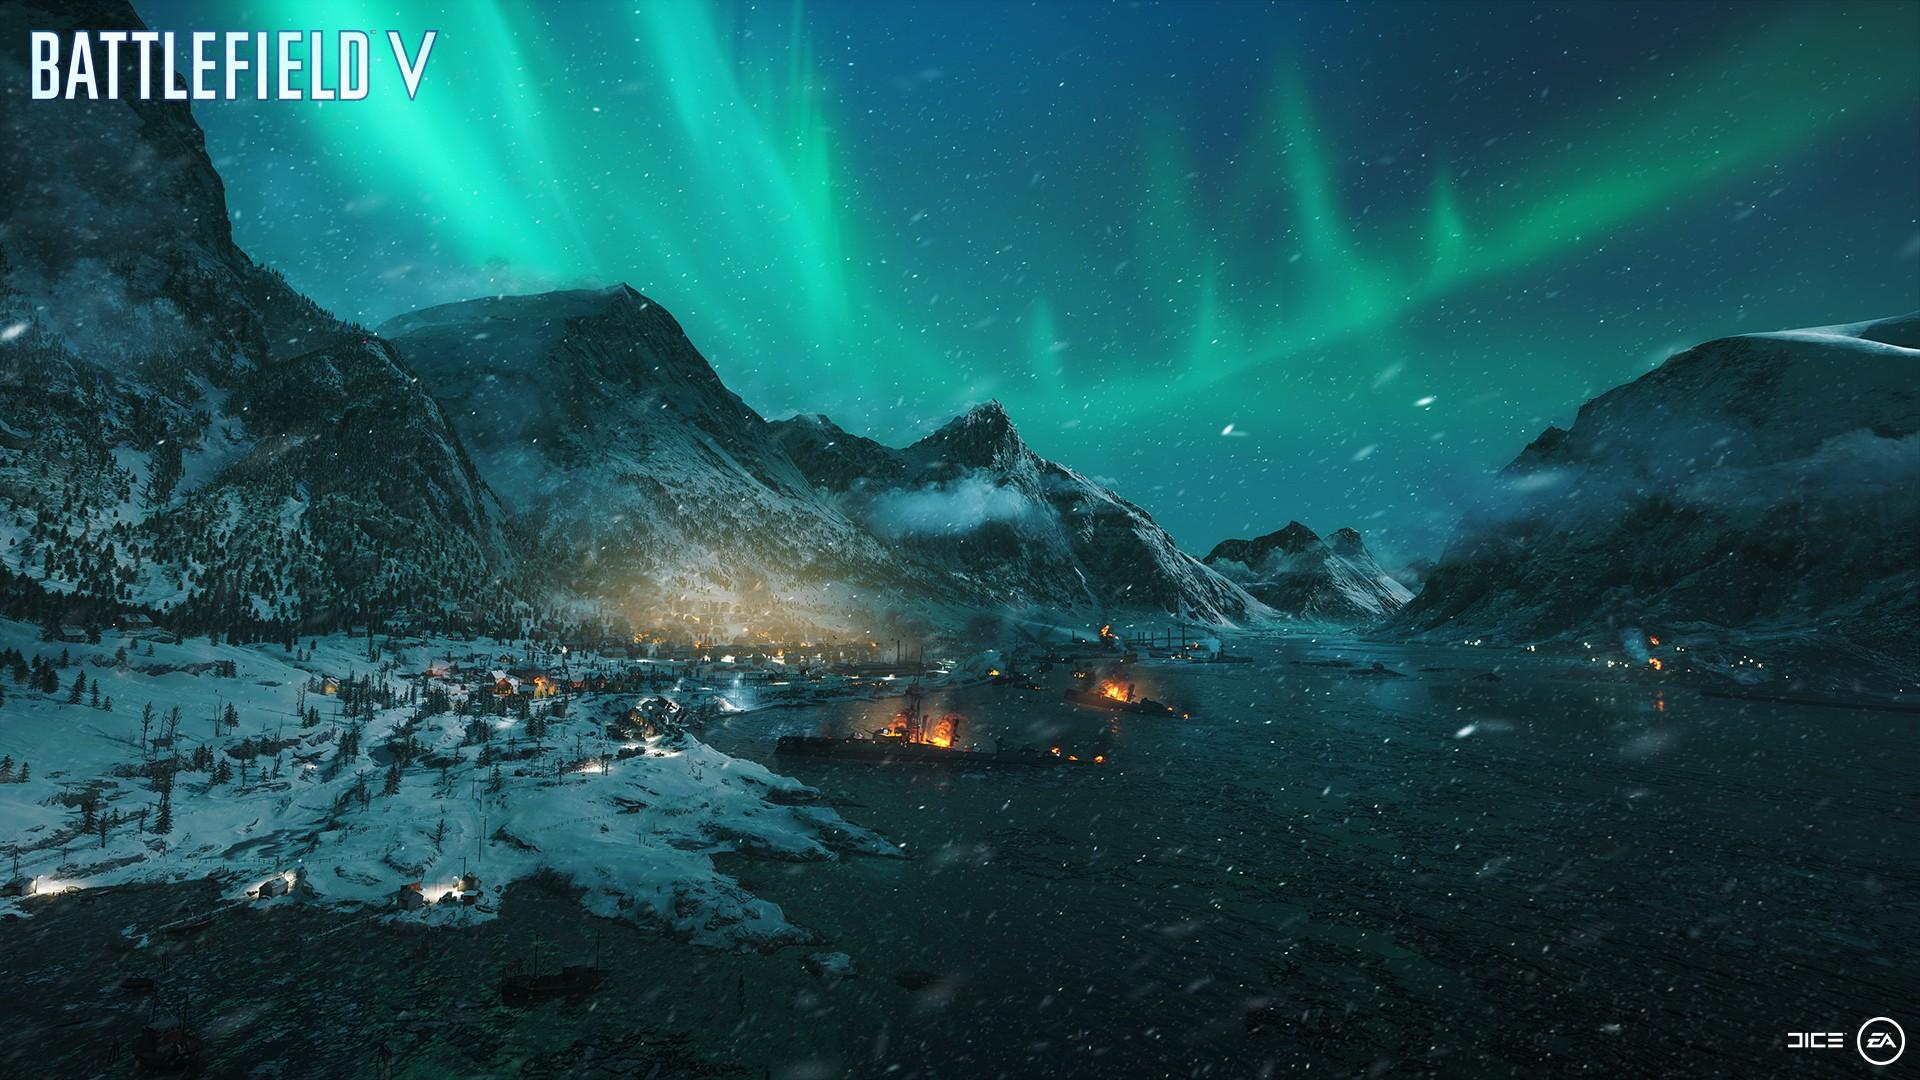 Download Wallpaper 1280x1280 Battlefield 4 Game Ea: Battlefield™ V For PC